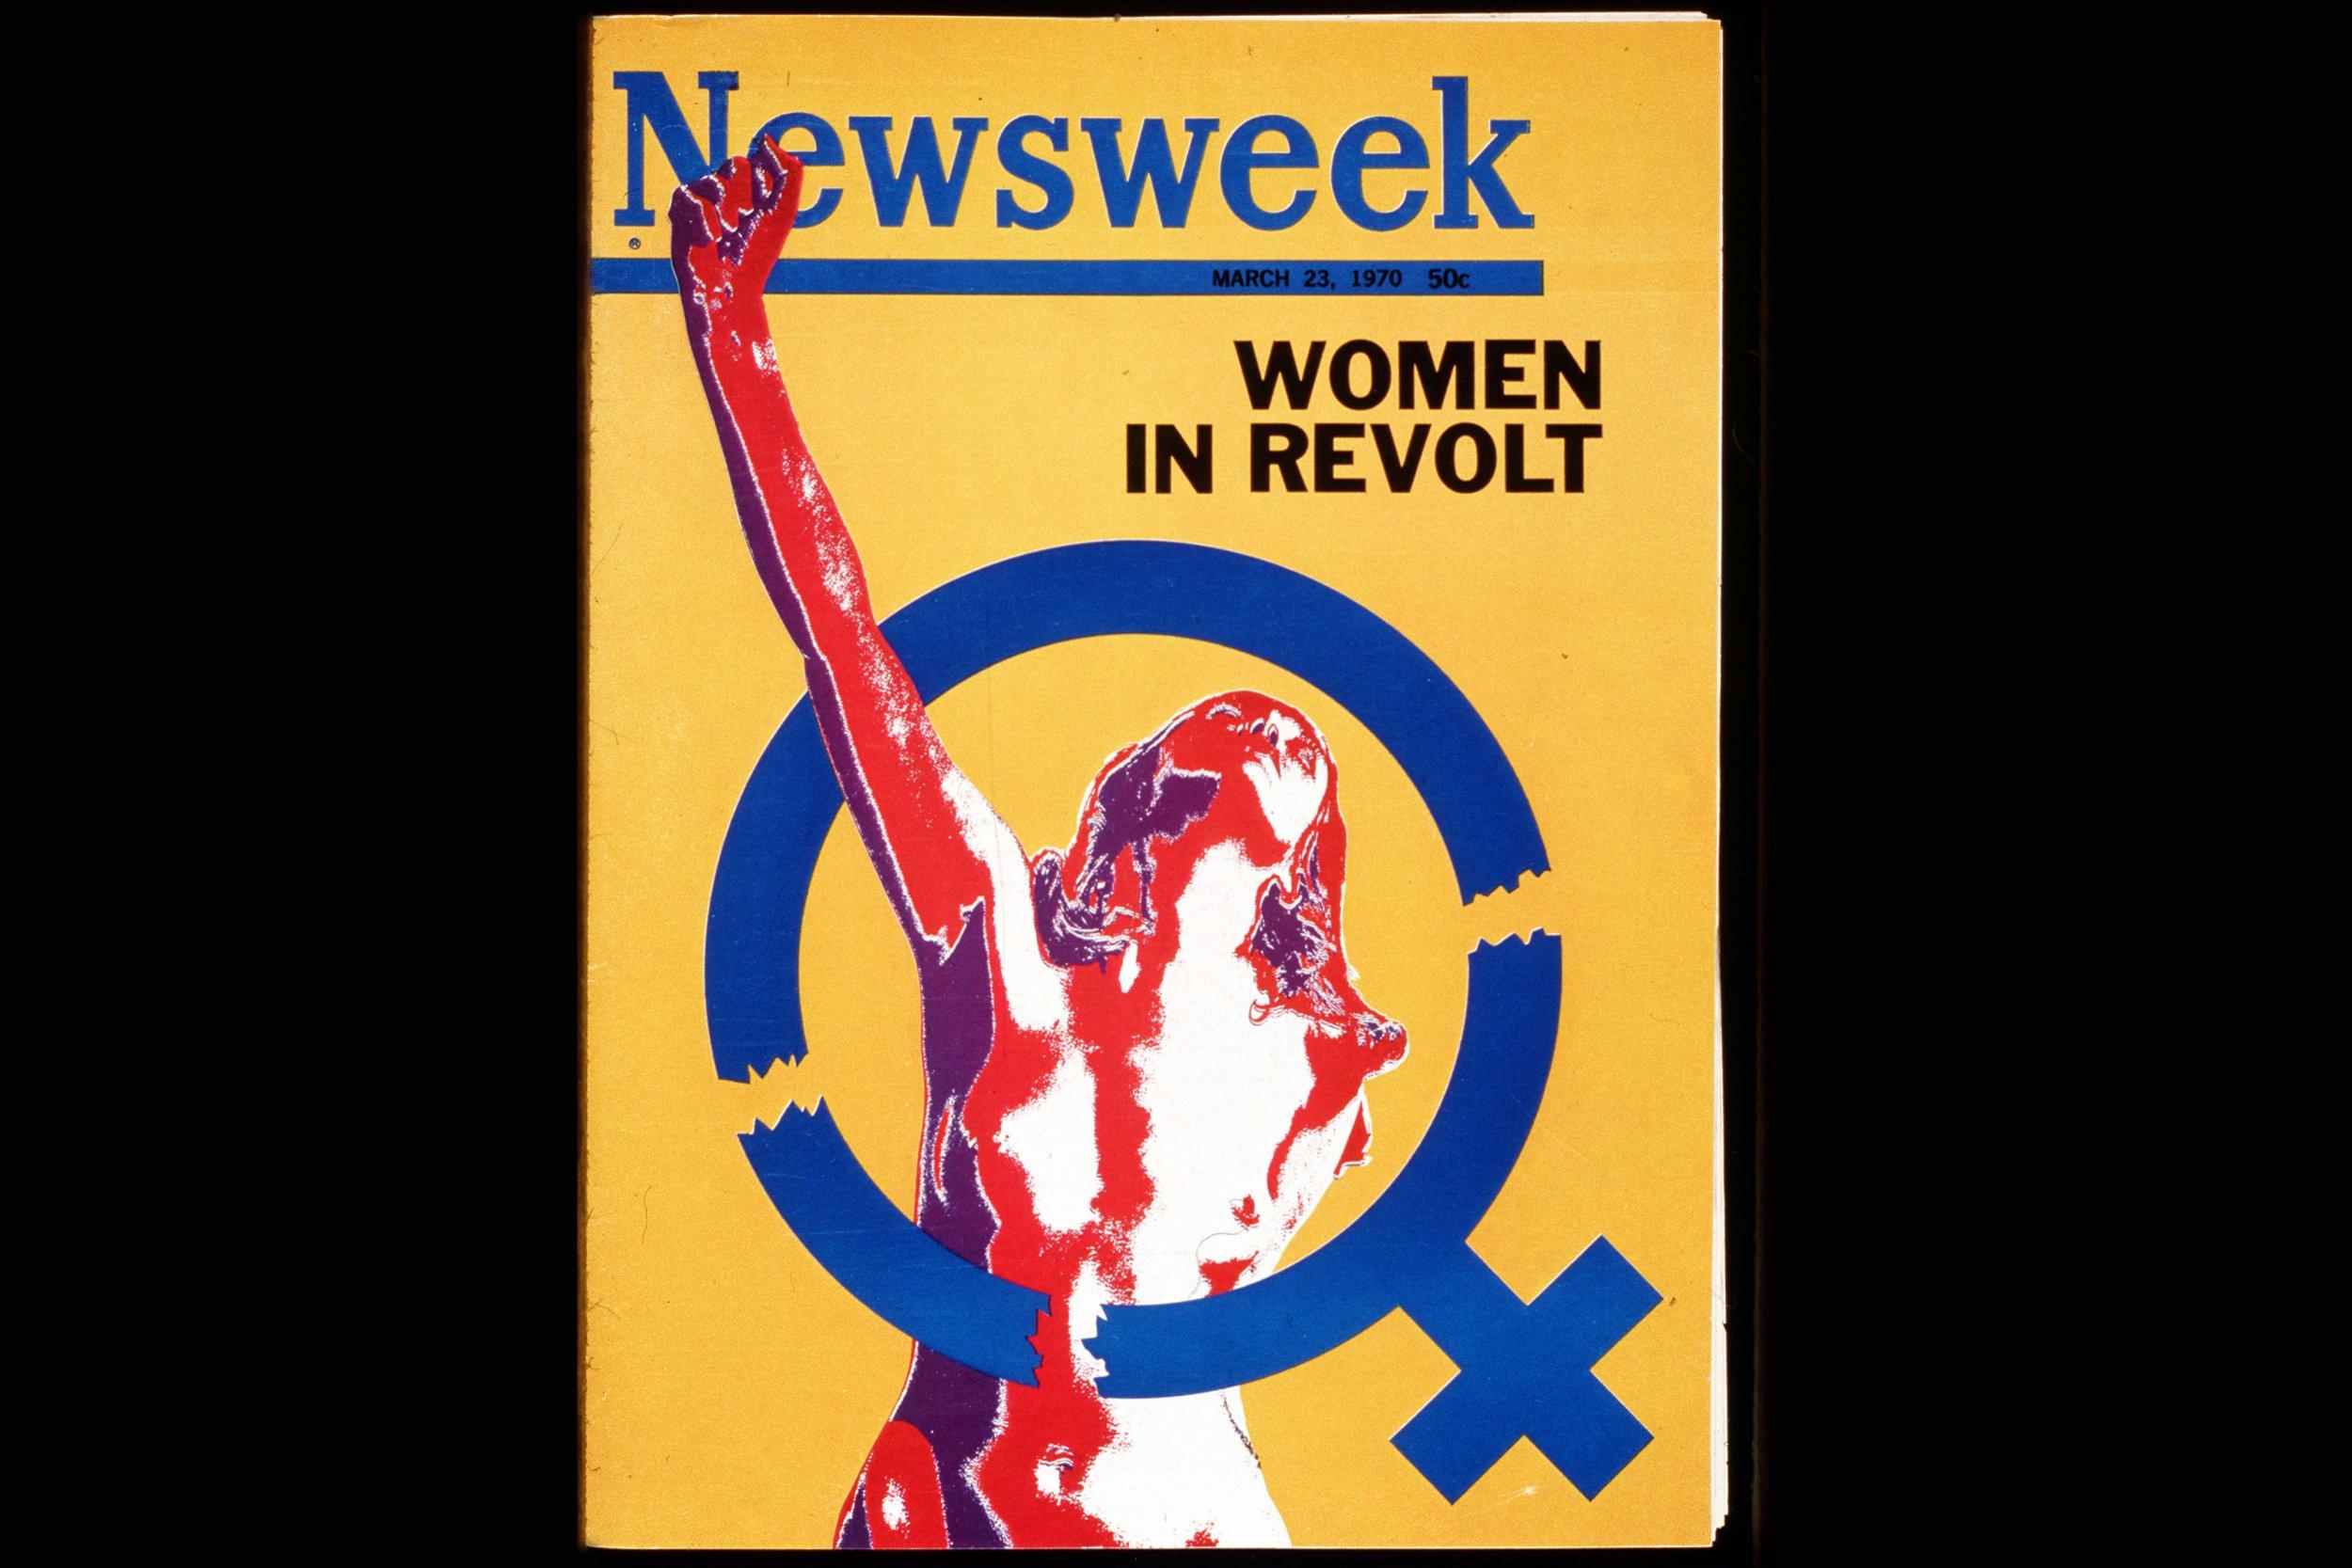 10-28-16 Newsweek cover Women in Revolt